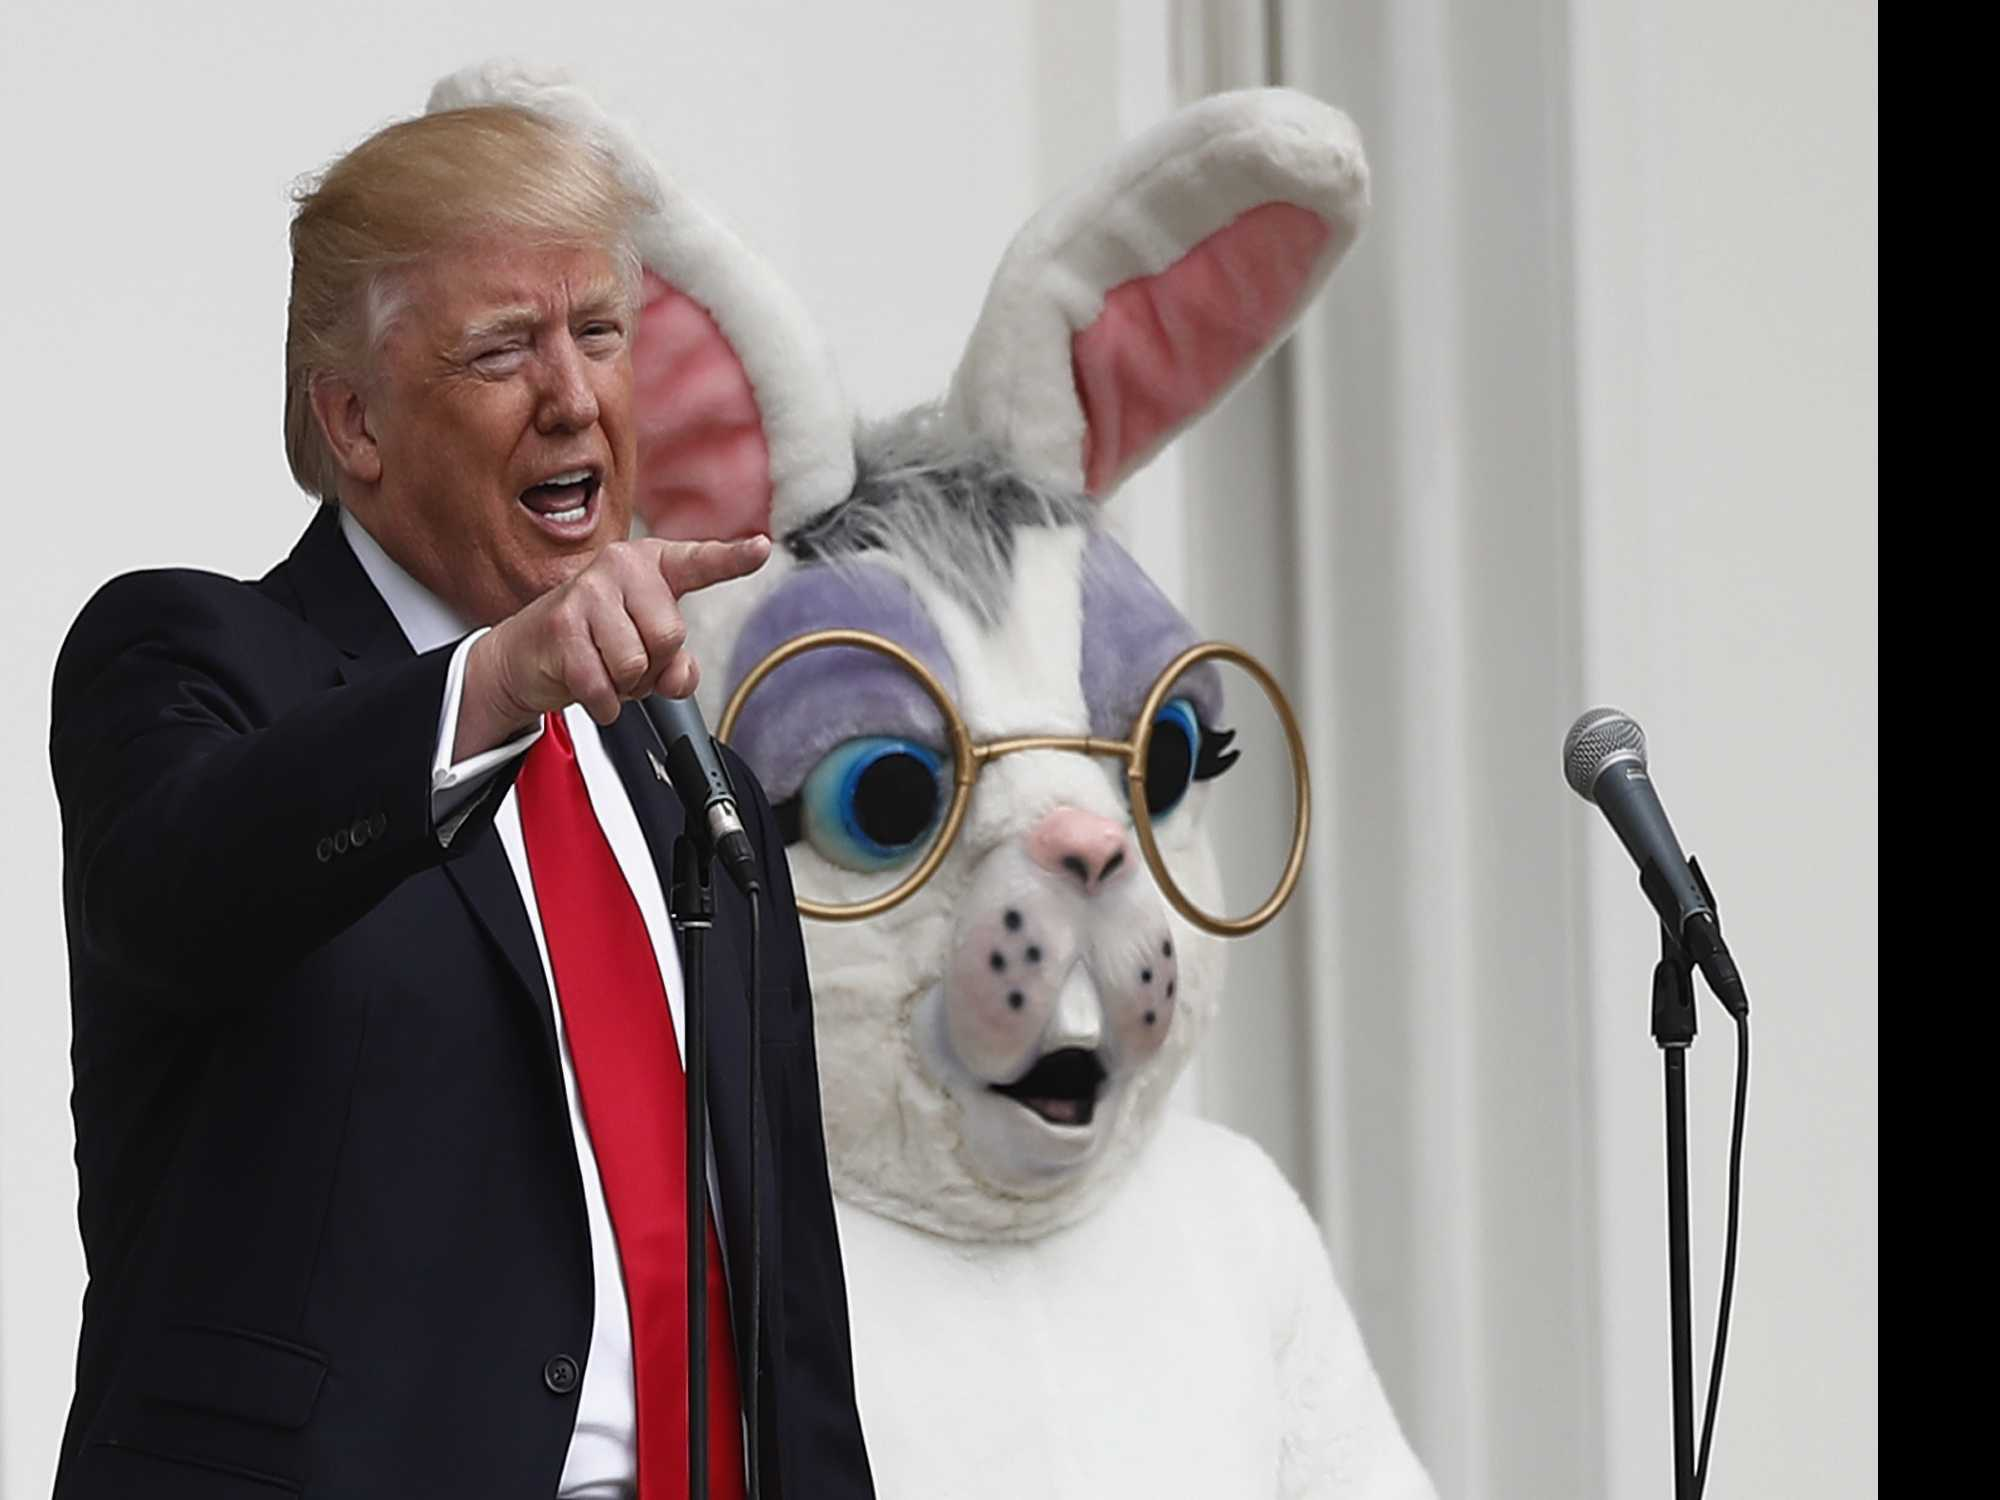 NYT: Trump Tells Russians Comey Was a 'Nut Job'